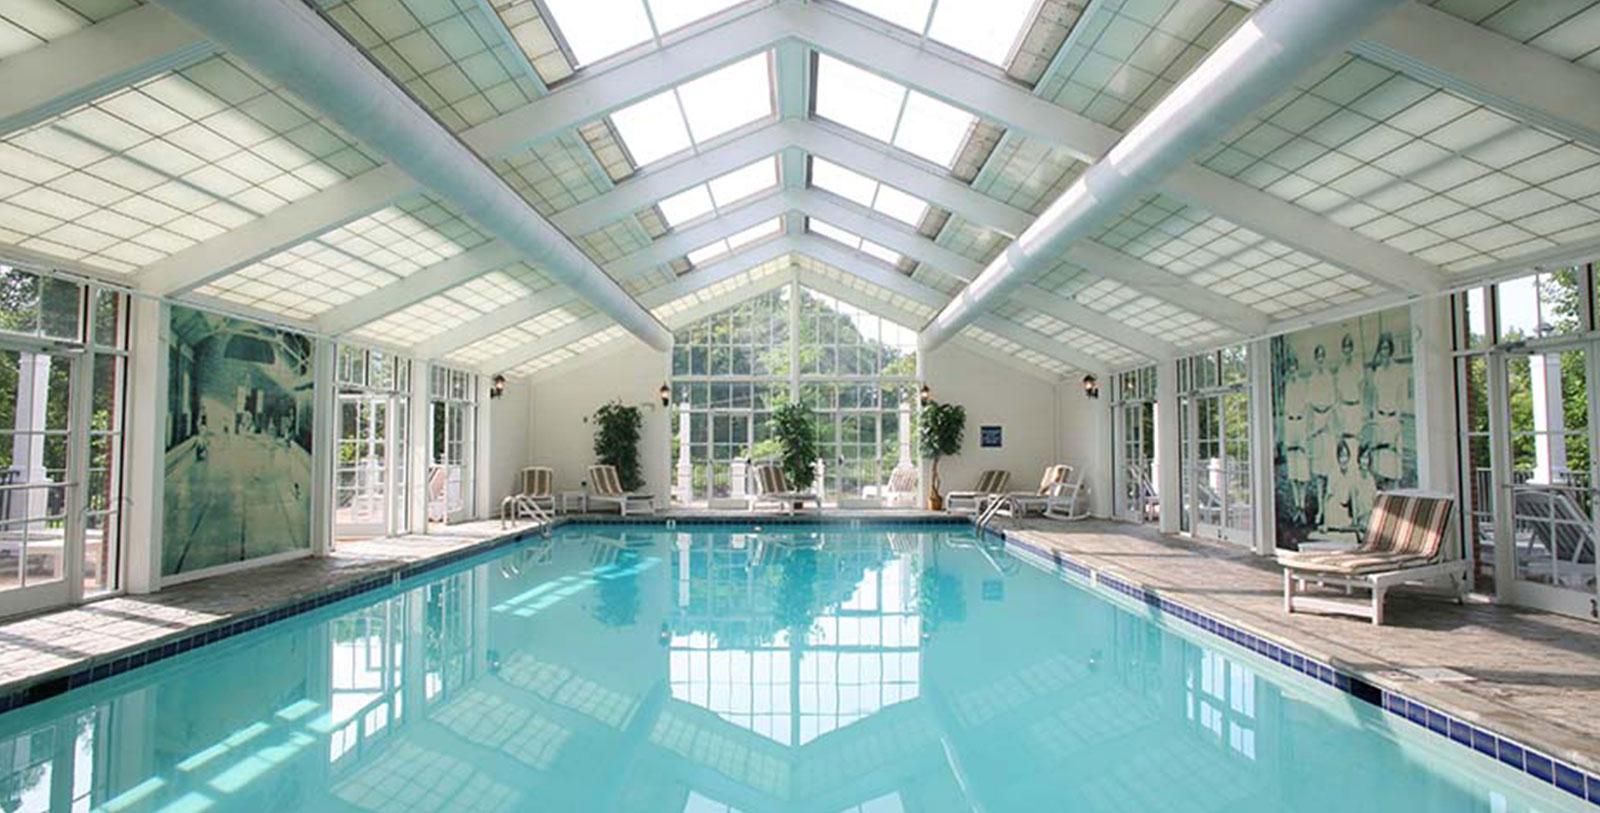 Image of Hotel Pool The Martha Washington Hotel & Spa, 1832, Member of Historic Hotels of America, in Abingdon, Virginia, Spa